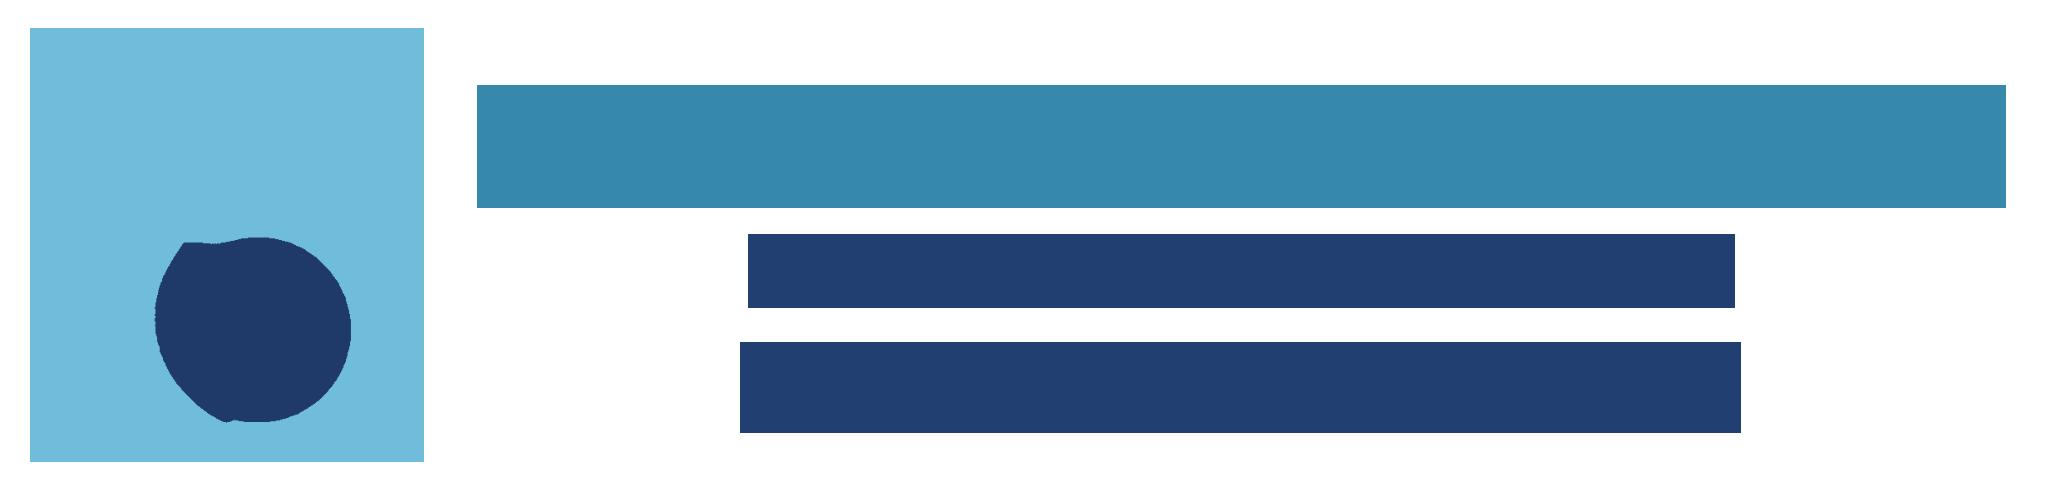 Shreveport Eye Specialists - Graphic design